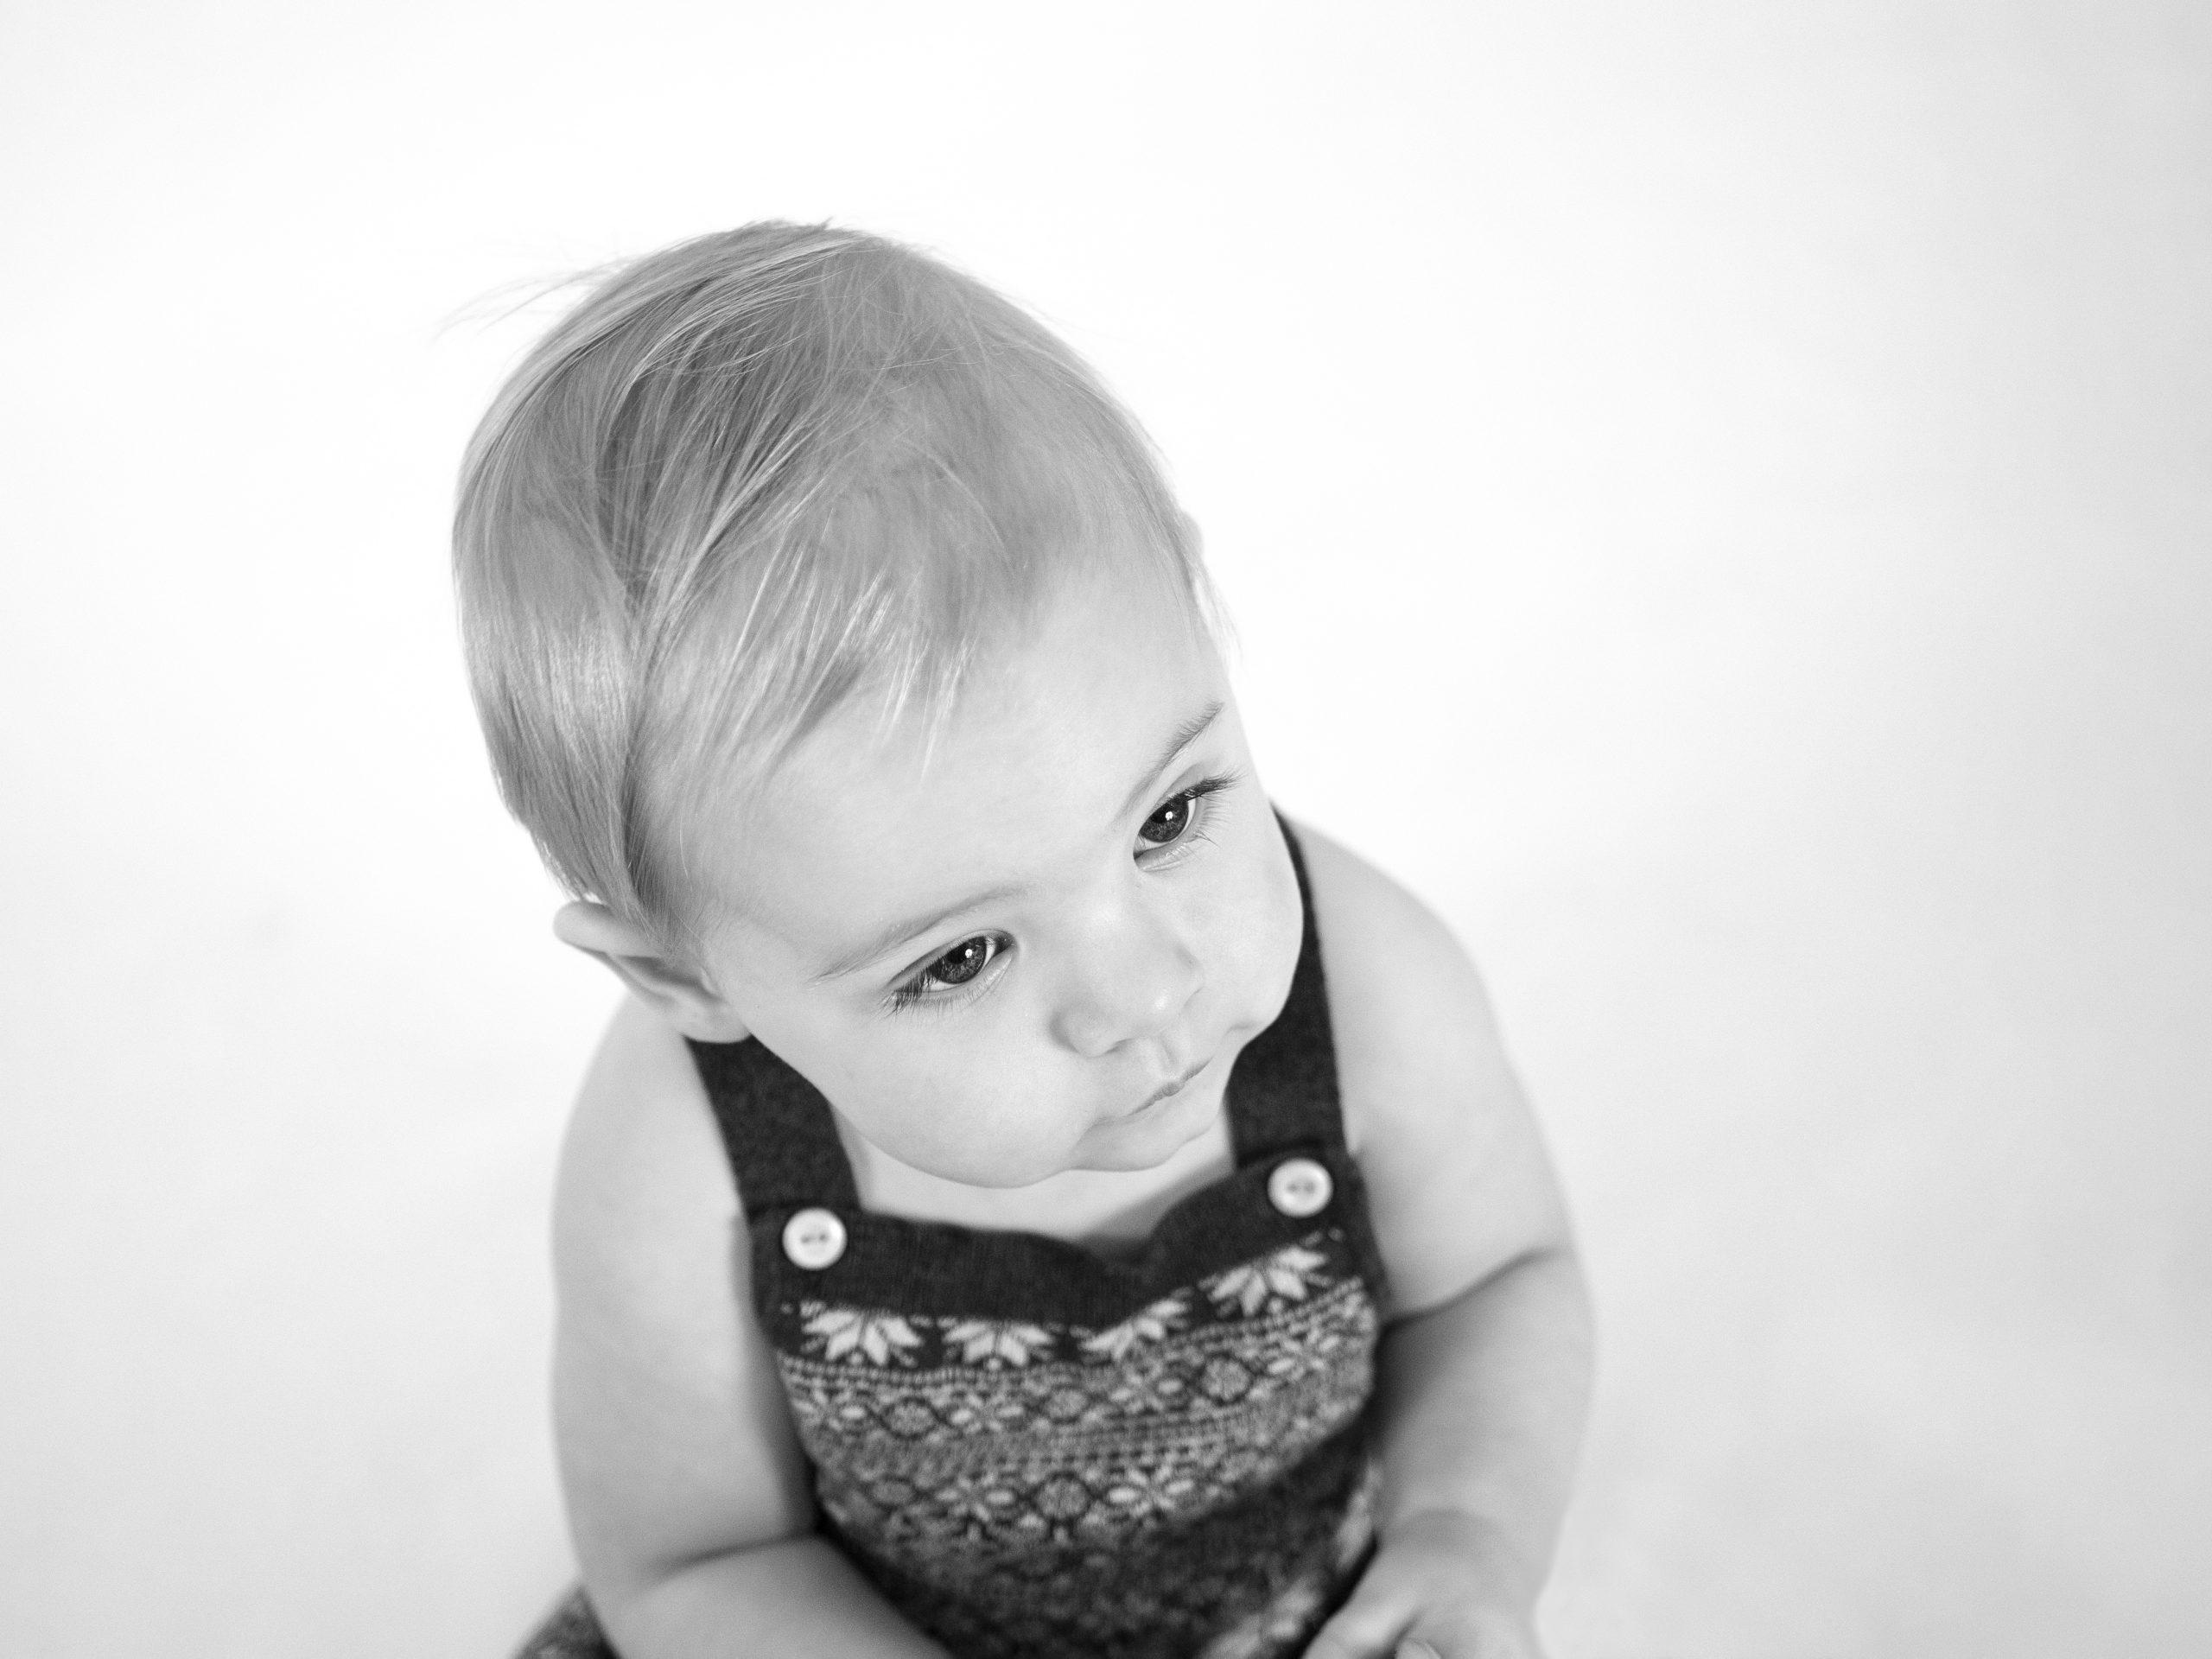 barnfotografering barnfotograf skåne sjöbo